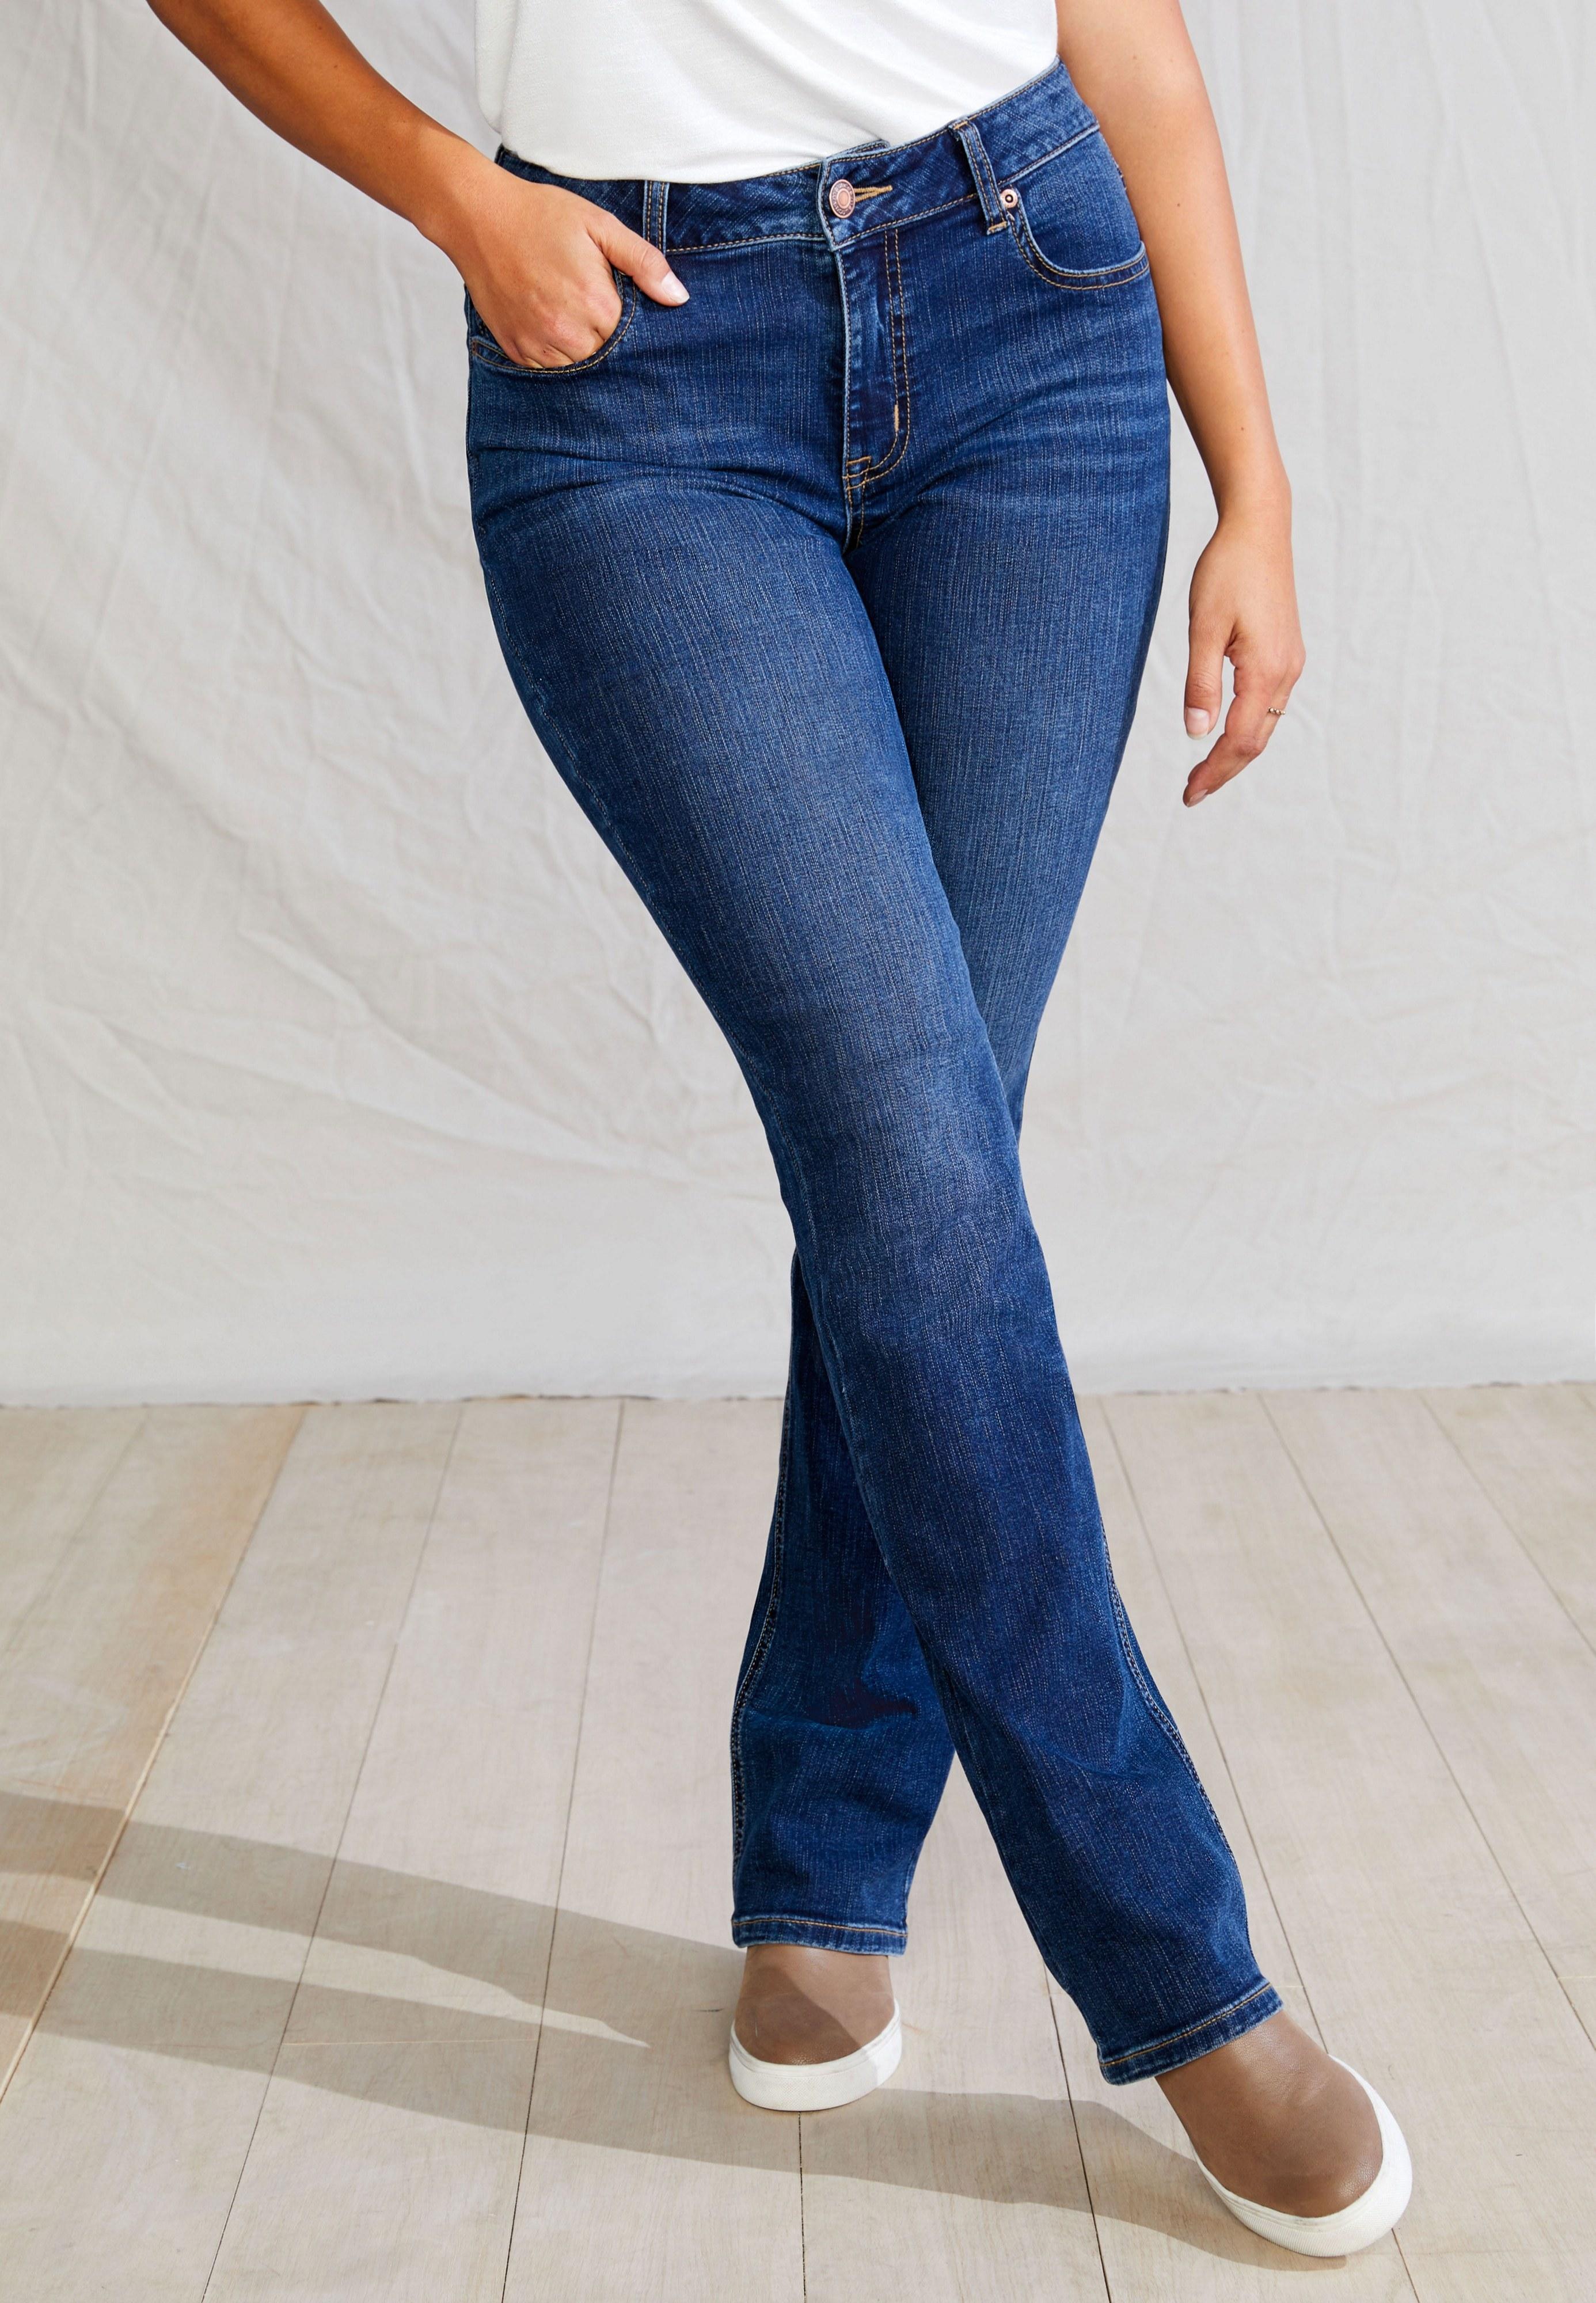 Model wearing a dark wash slim boot pair